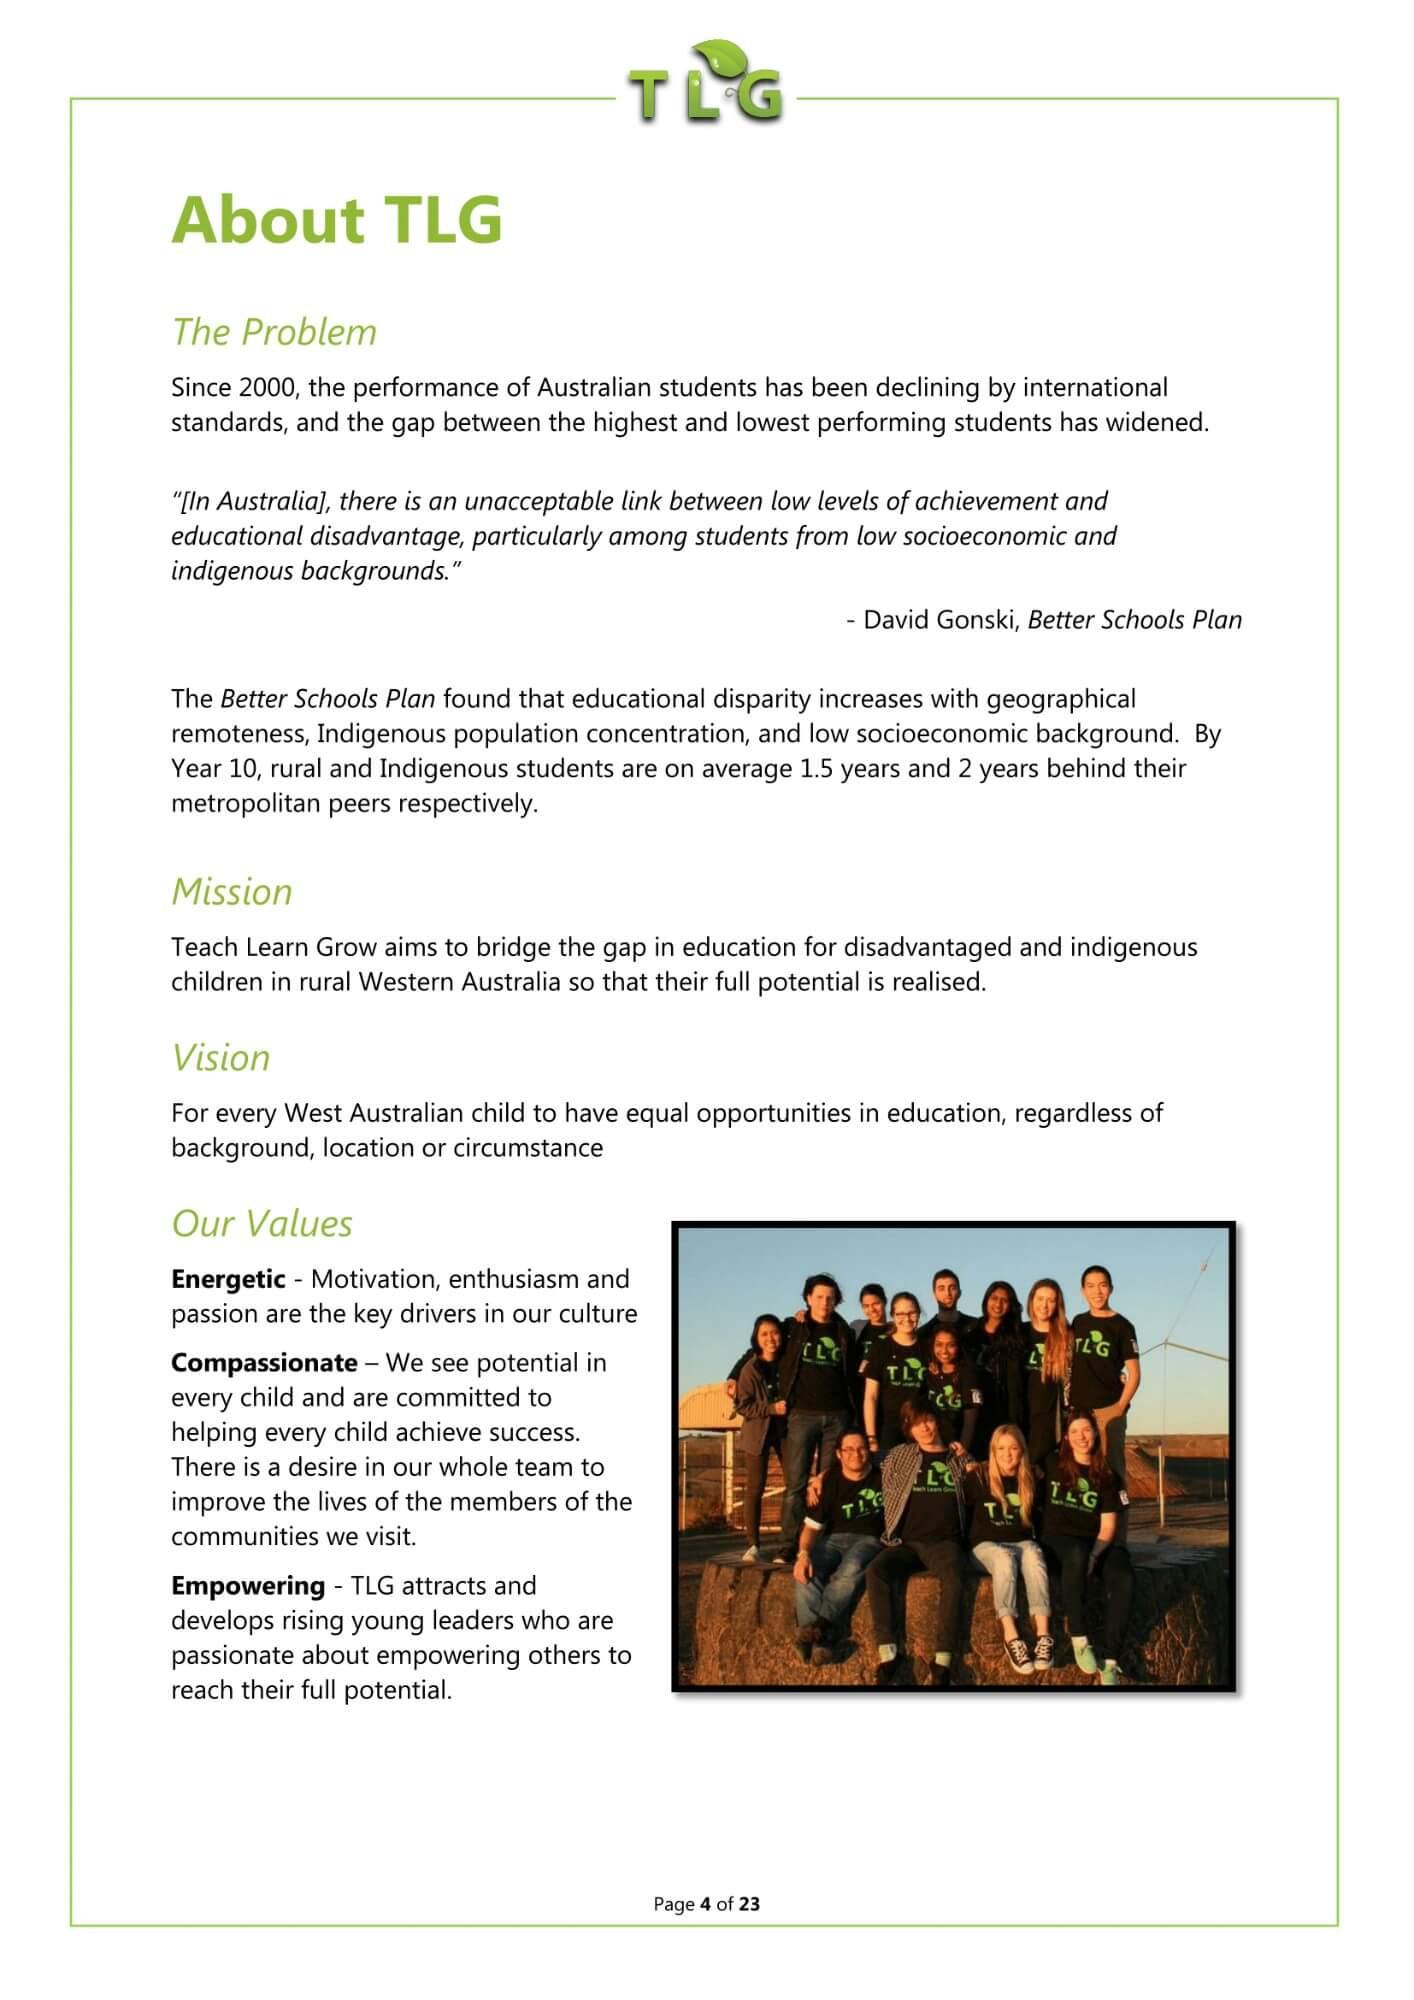 tlg-annual-report-FY13-04.jpg